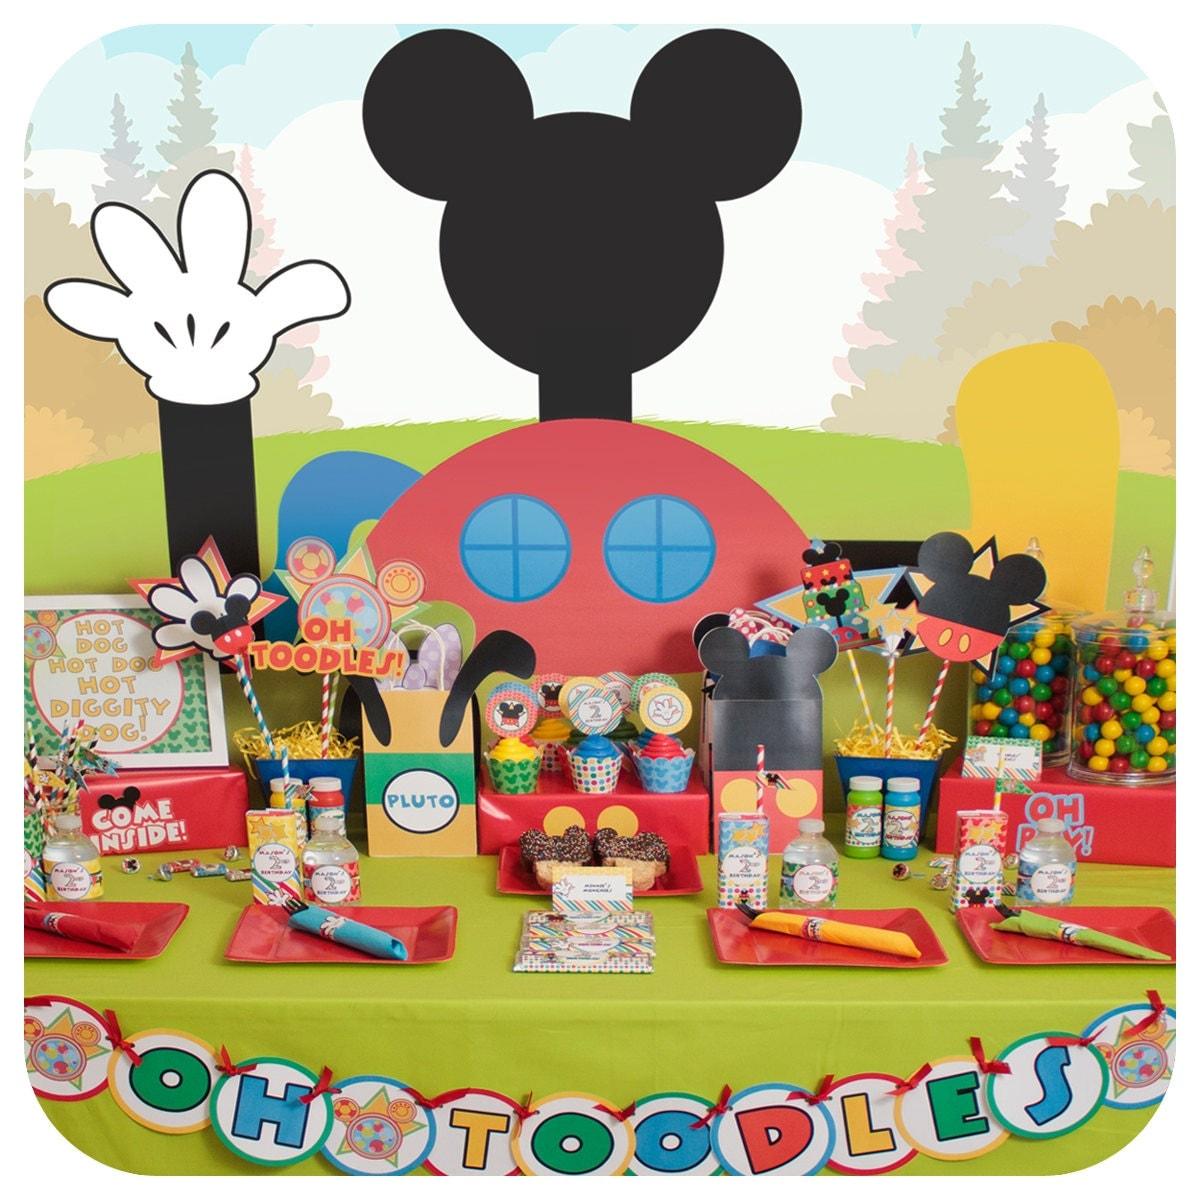 Mickey Mouse Mickey Mouse Party Mickey Mouse Clubhouse